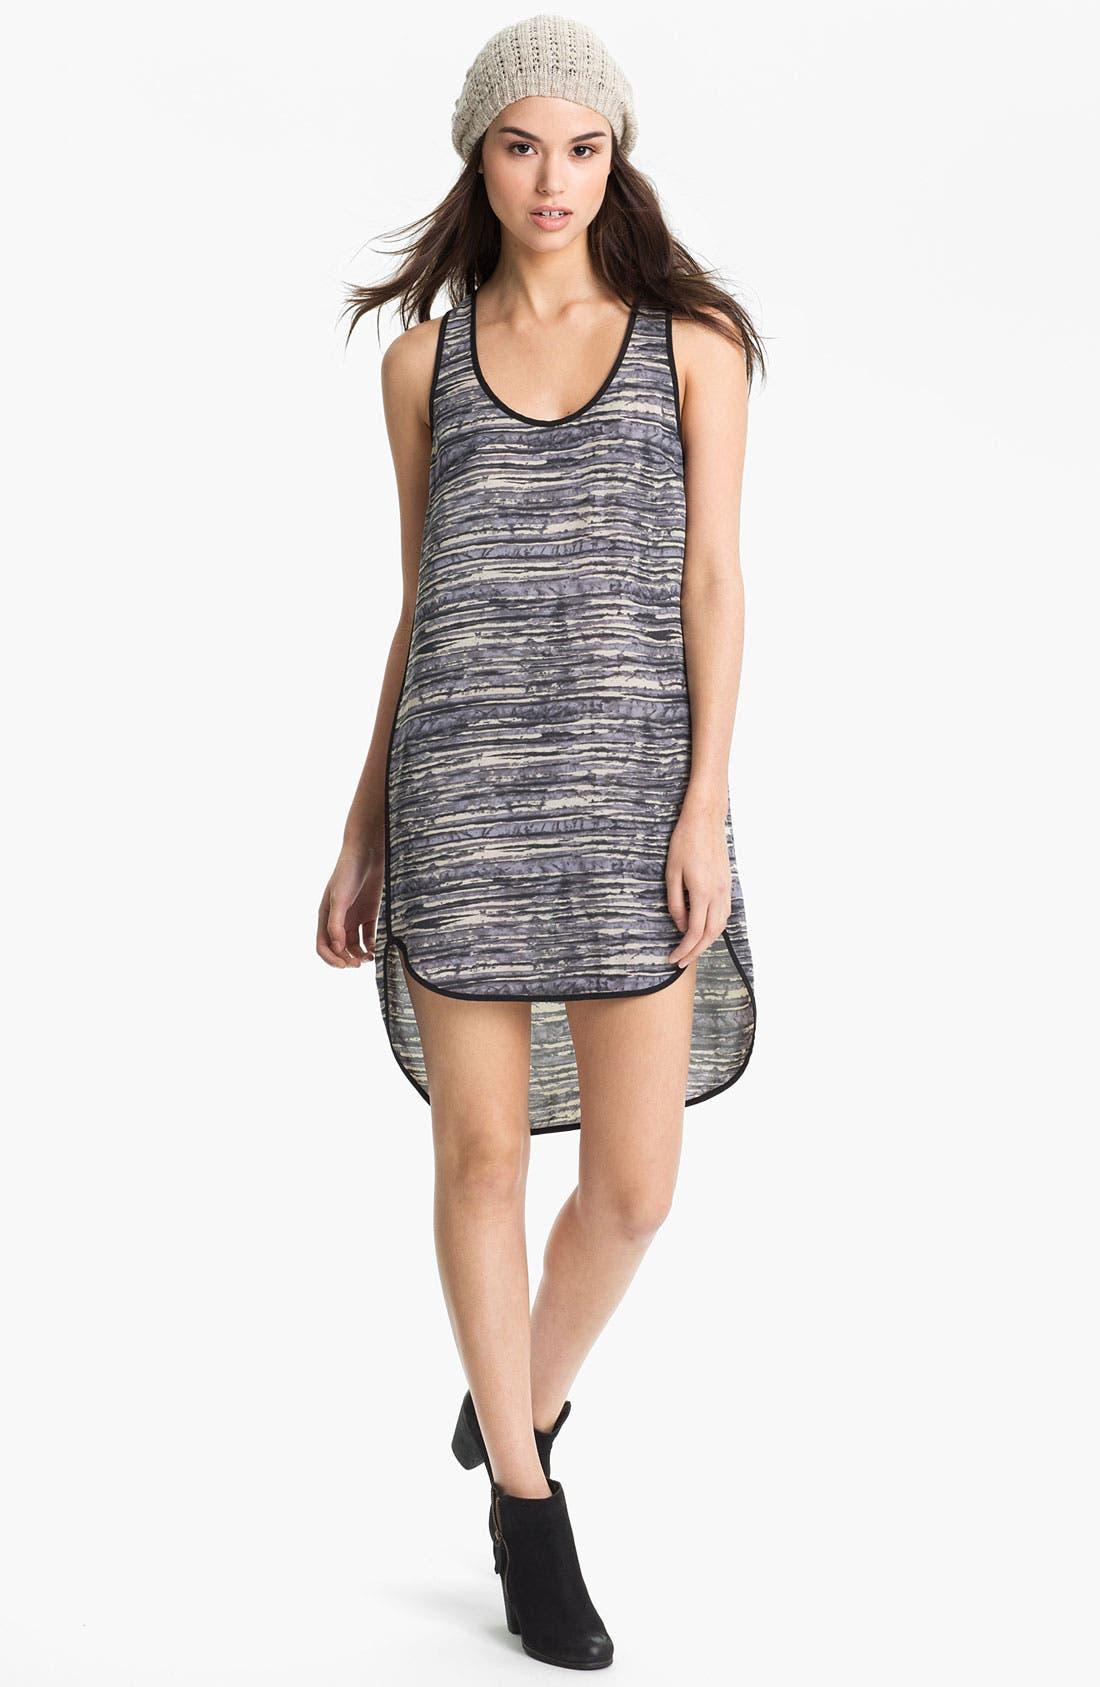 Alternate Image 1 Selected - Print High/Low Tank Dress